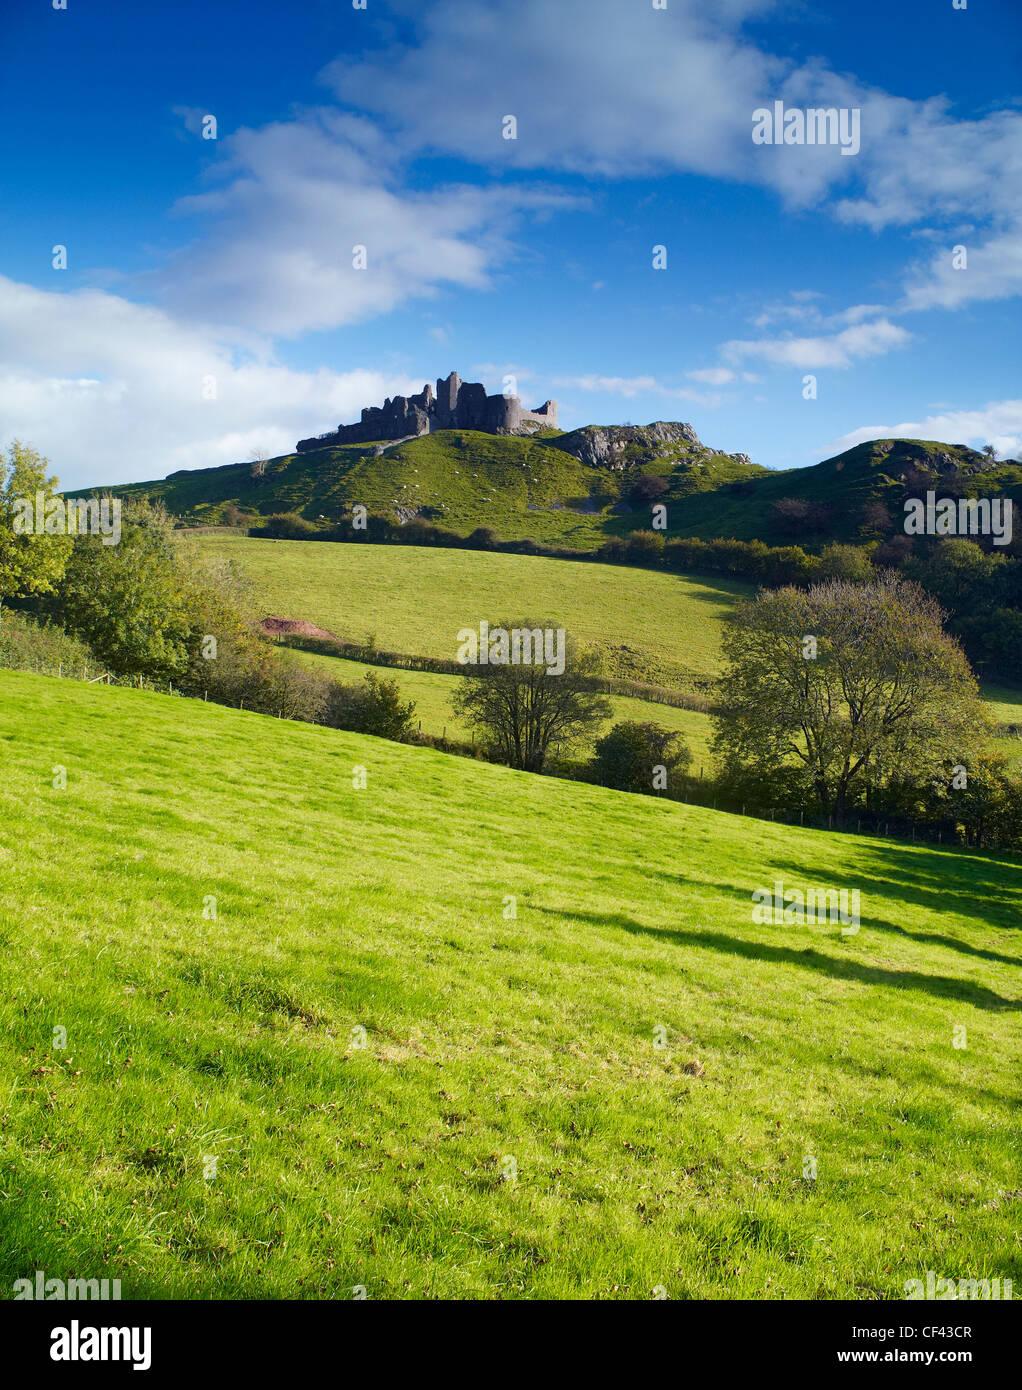 View across rolling hills towards Carreg Cennen Castle. - Stock Image